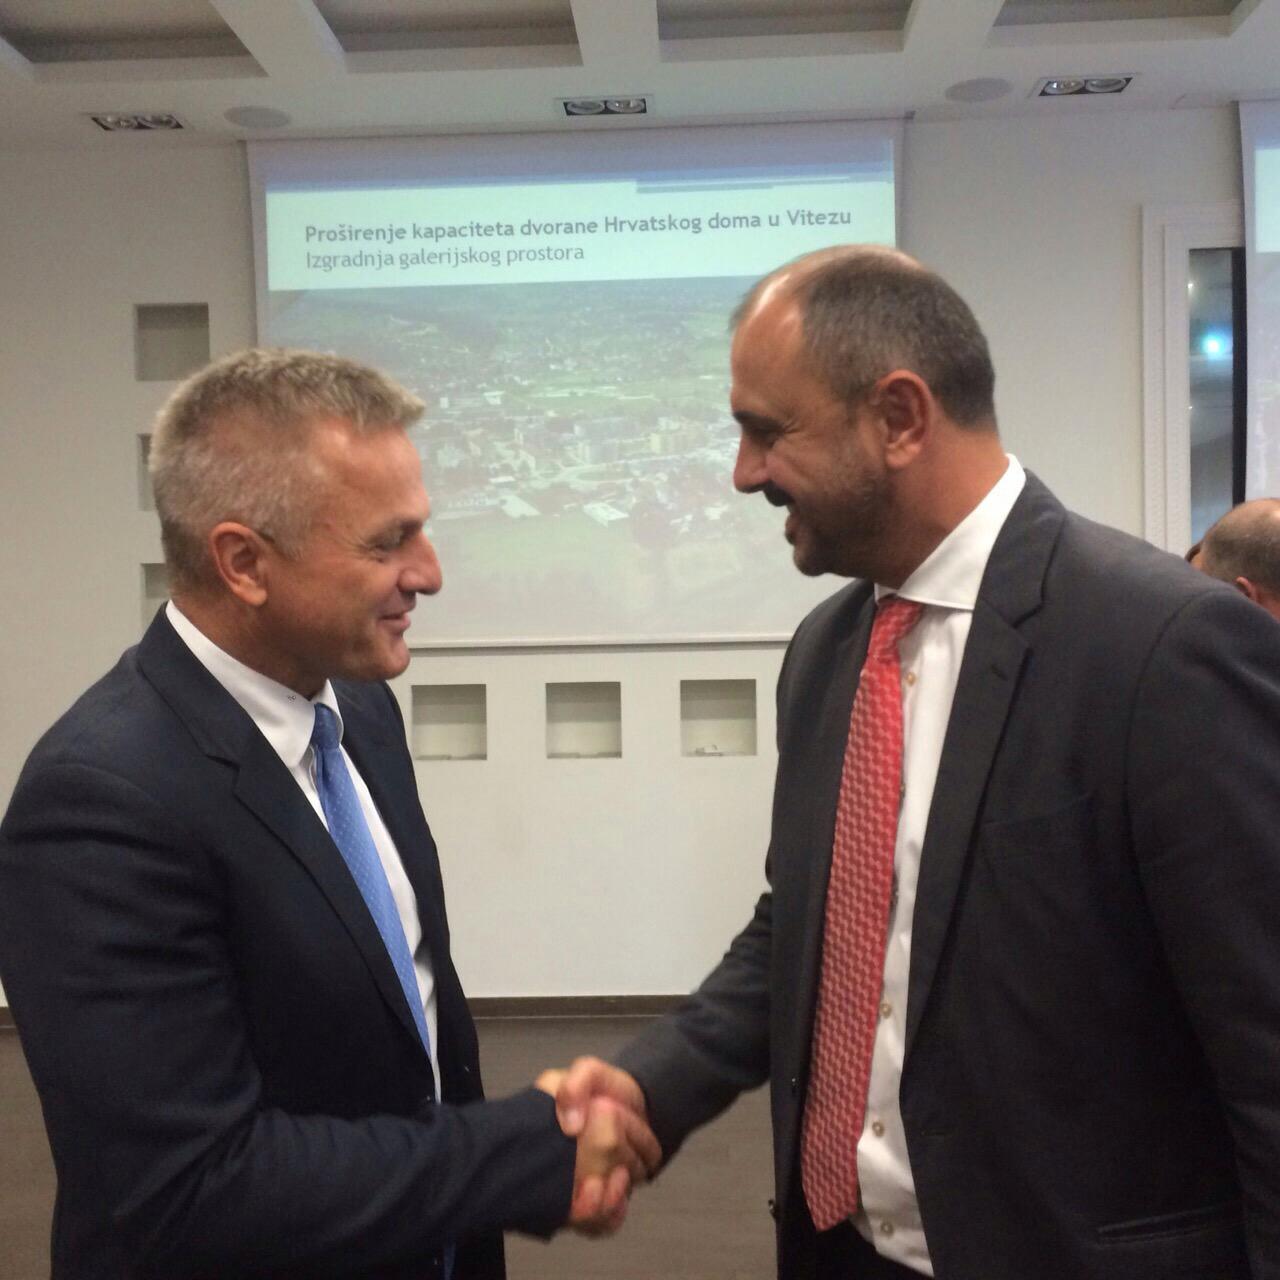 Općinski načelnik Branko Bago u Zagrebu potpisao ugovor za nastavak izgradnje Osnovne škole fra Petra Bakule